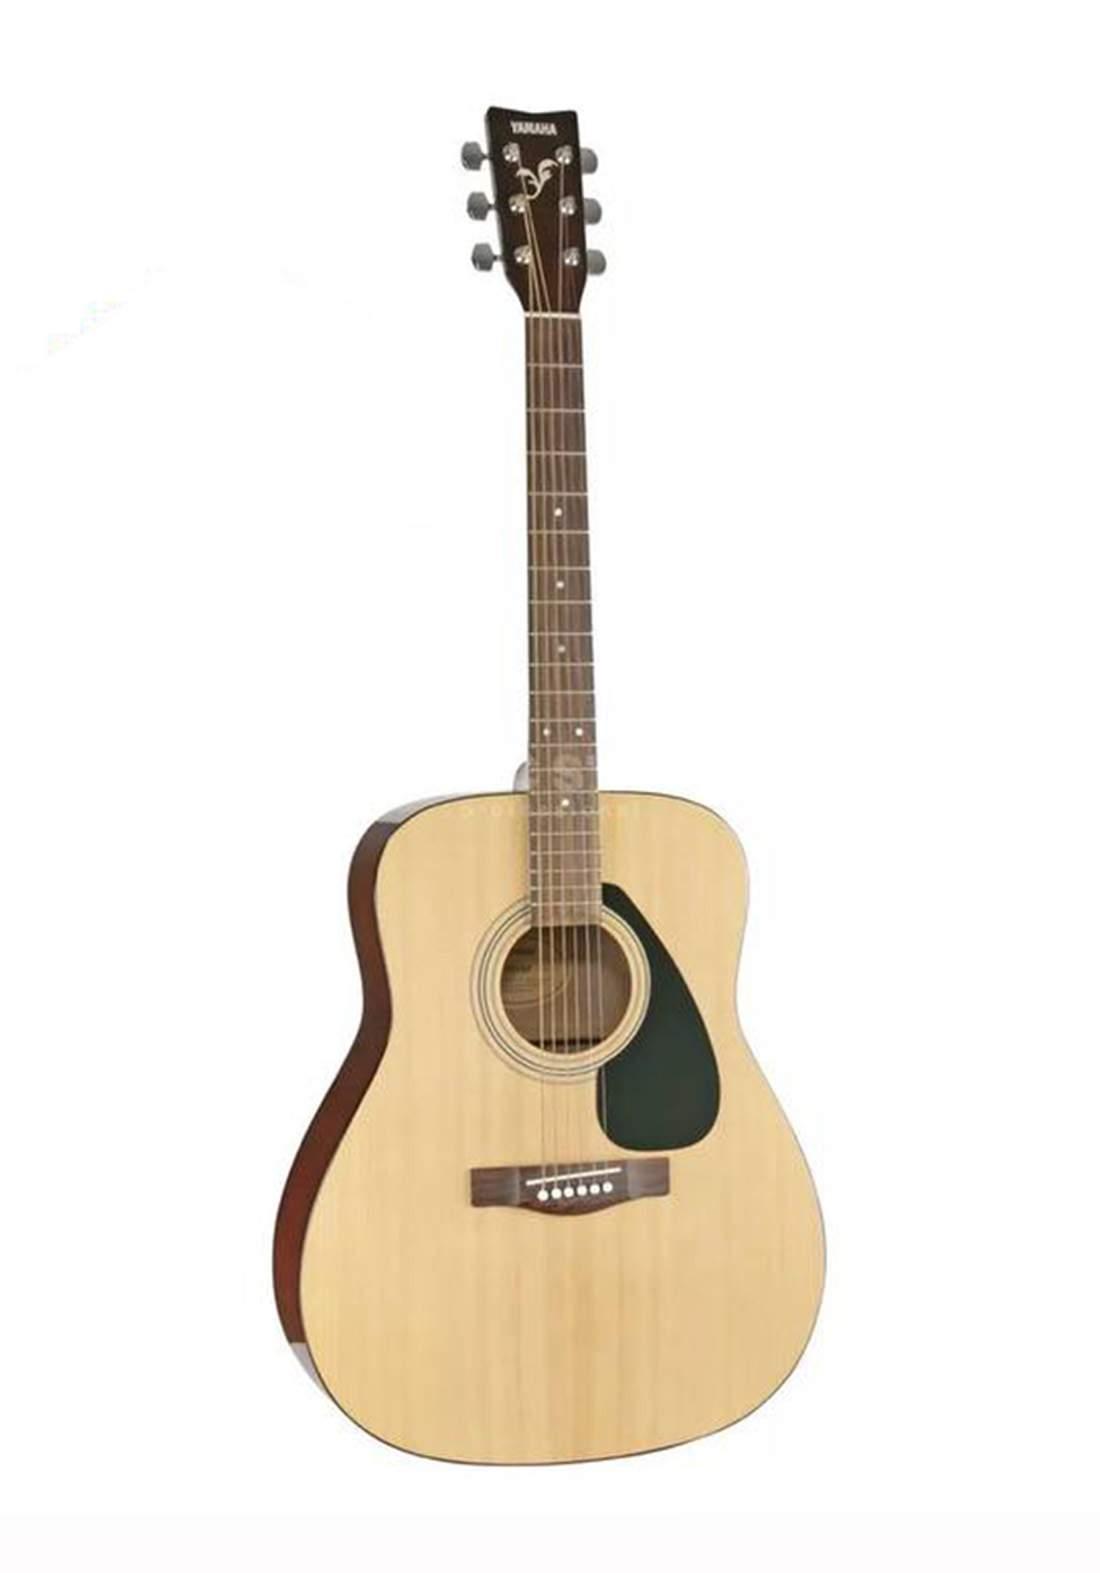 Yamaha Acoustic Guitar F310 - جيتار اكوستك